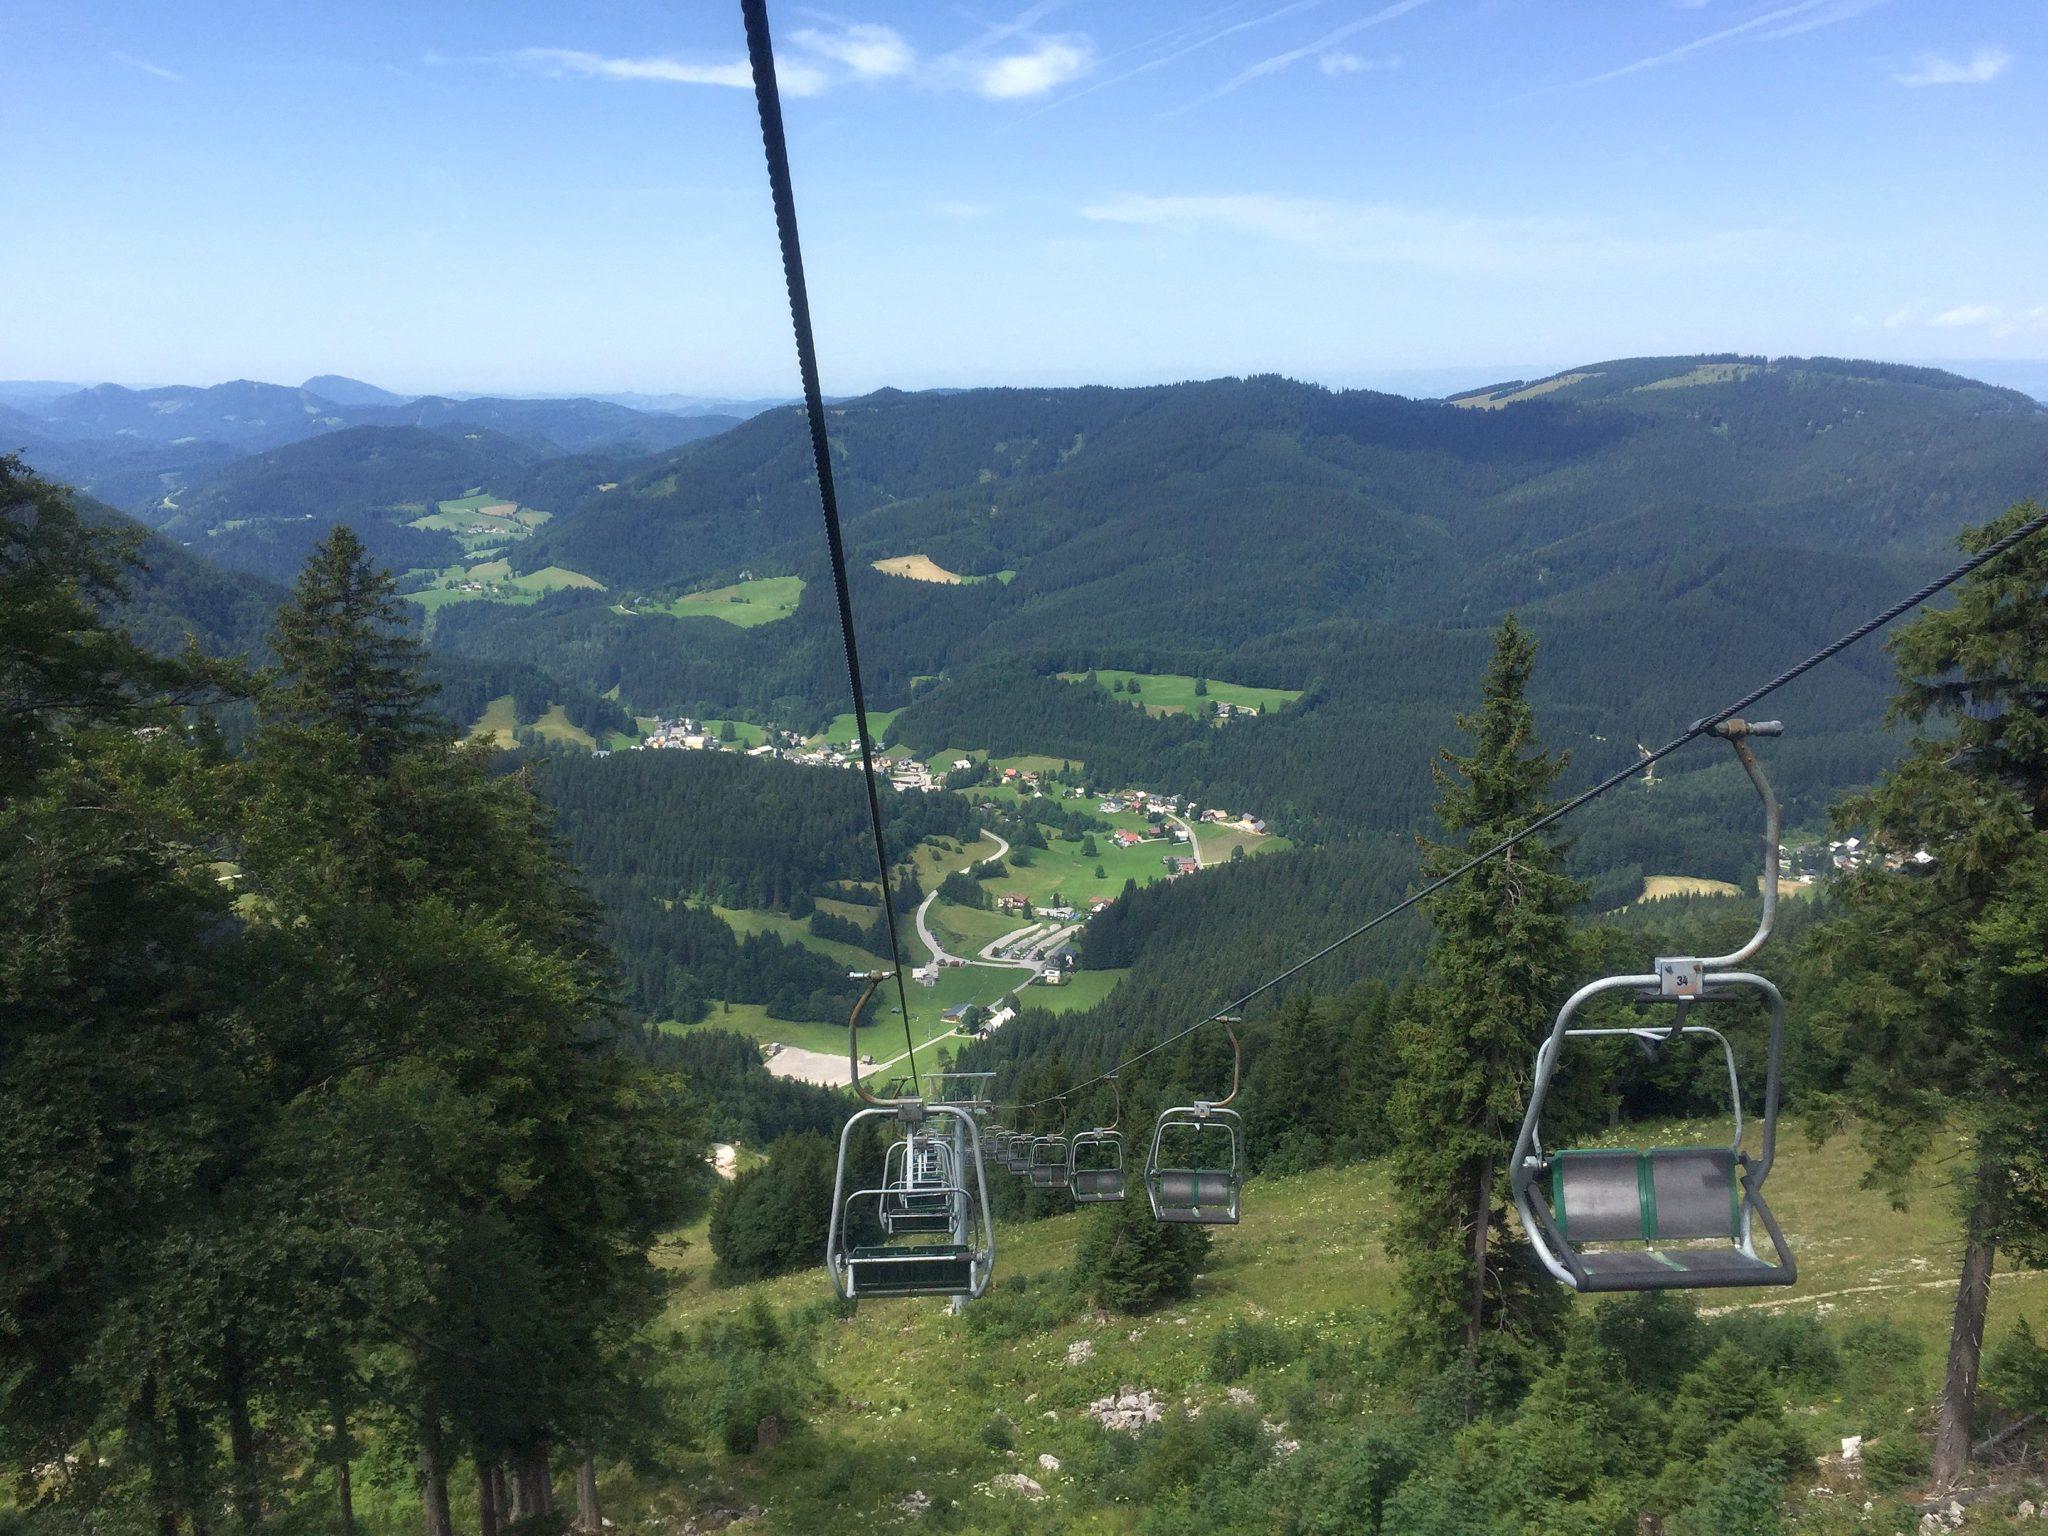 Alsó ausztria úti célok